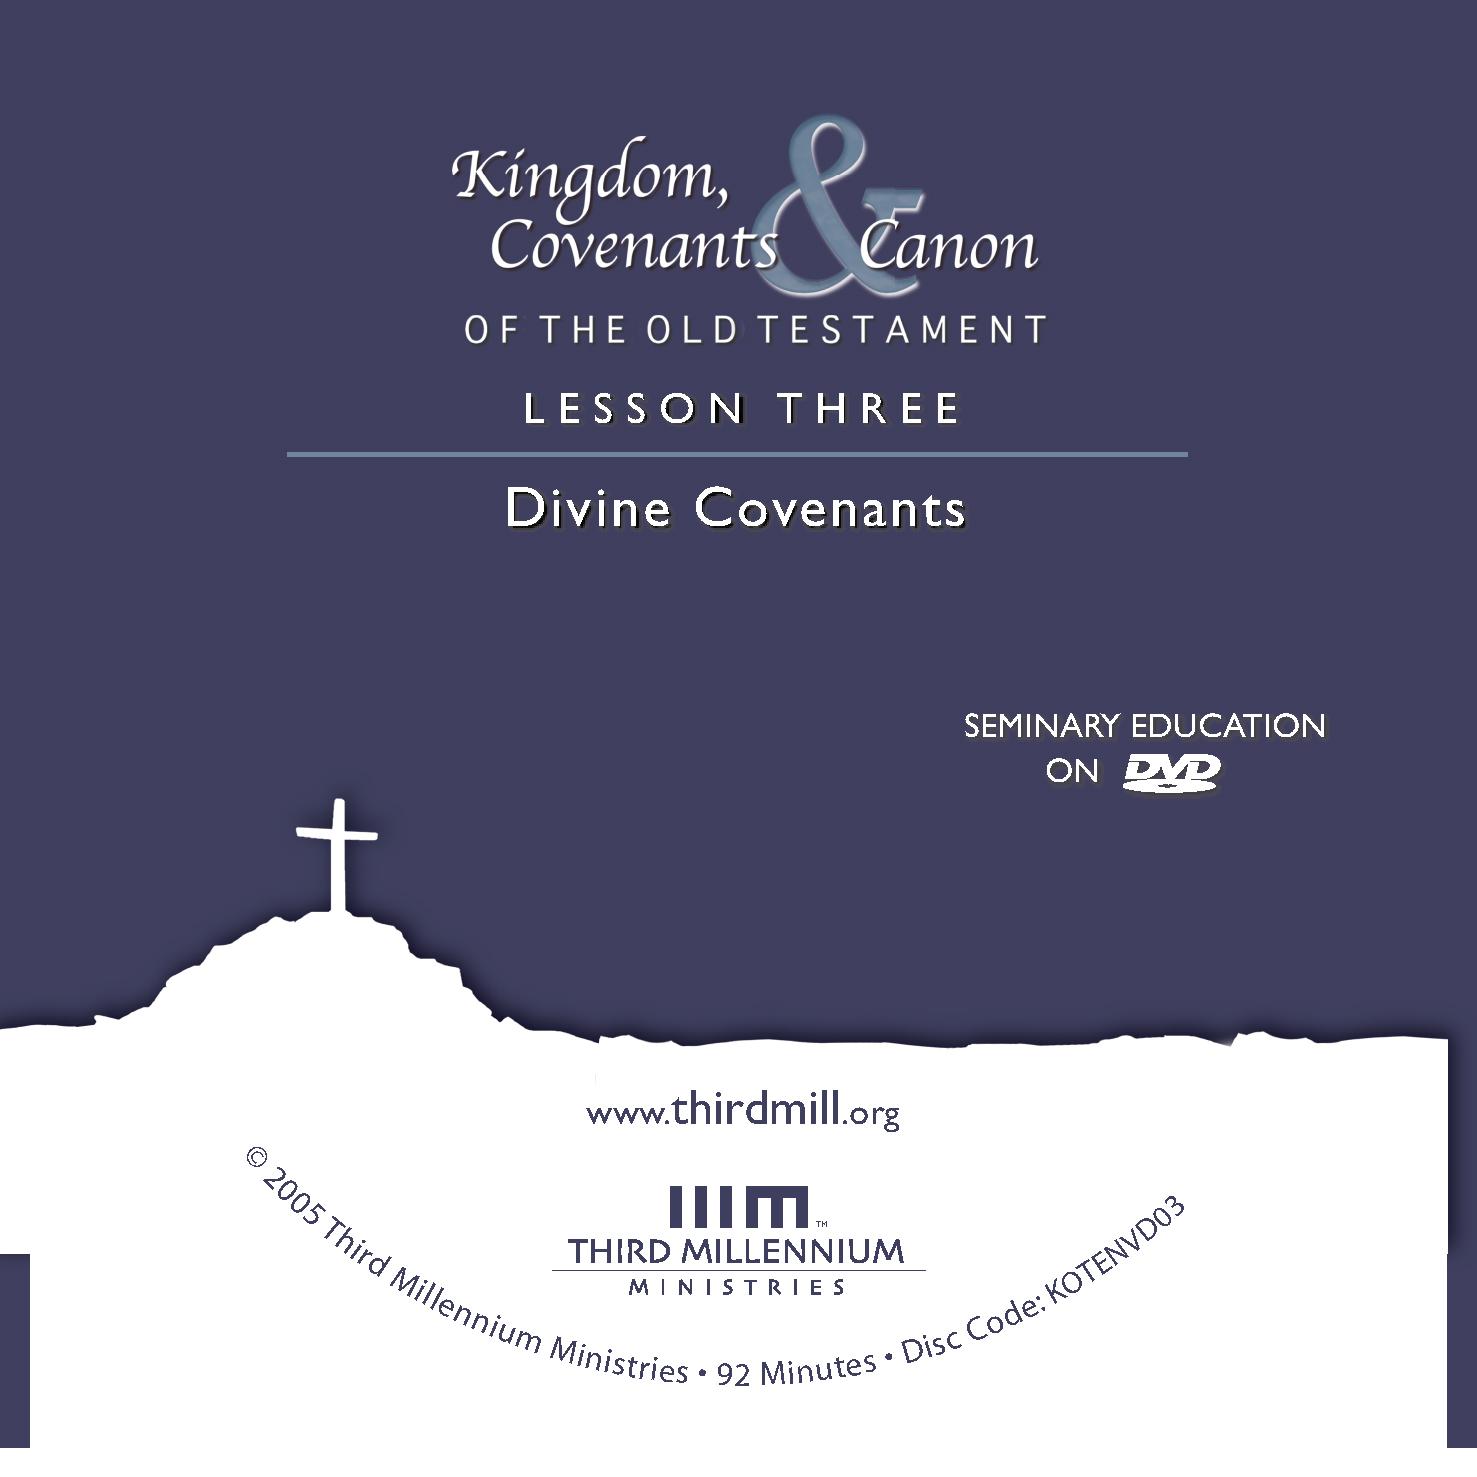 Kingdom, Covenants & Canon of the Old Testament: Divine